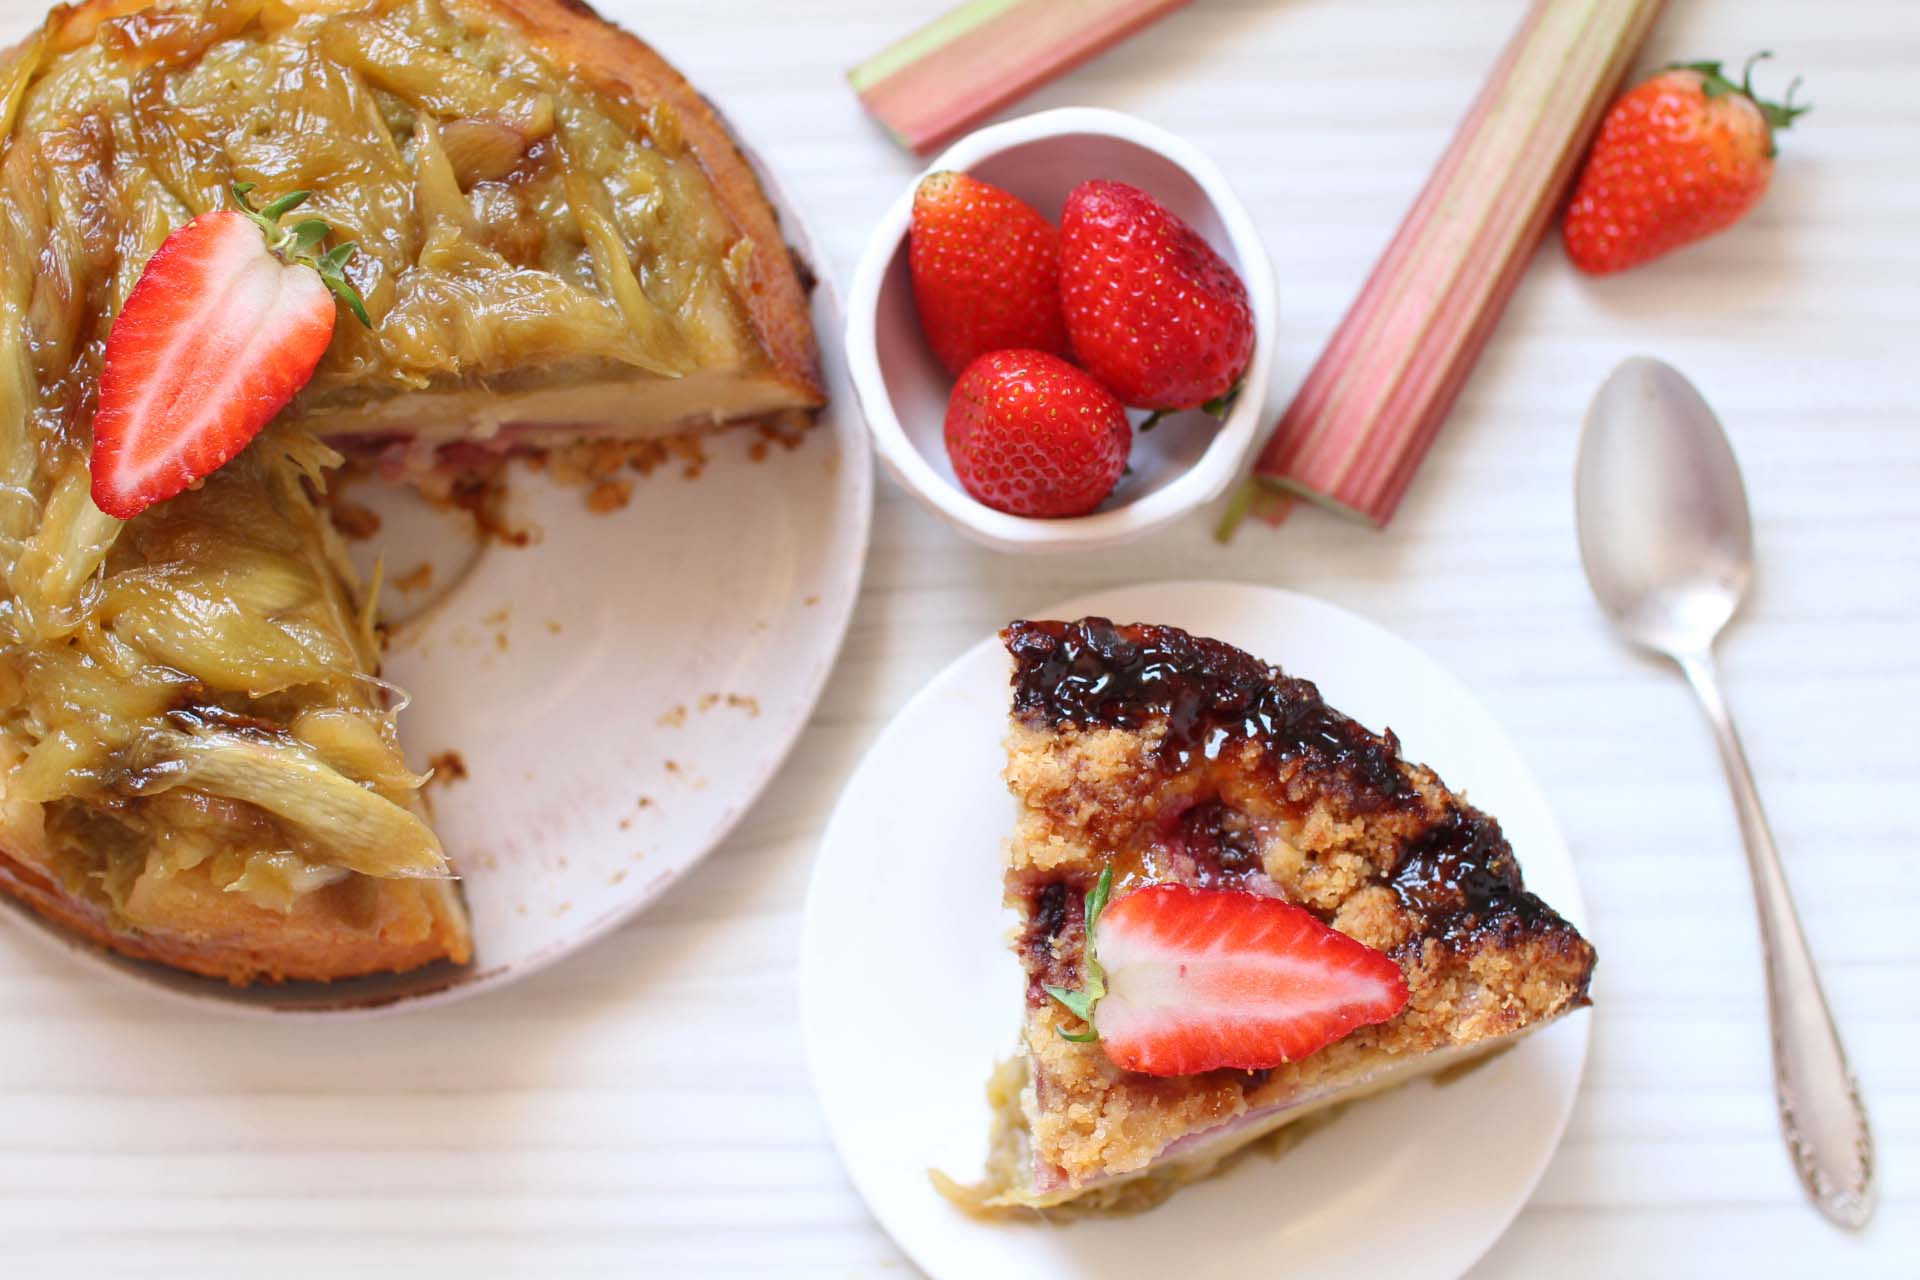 gateau renverse rhubarbe fraises martha stewart